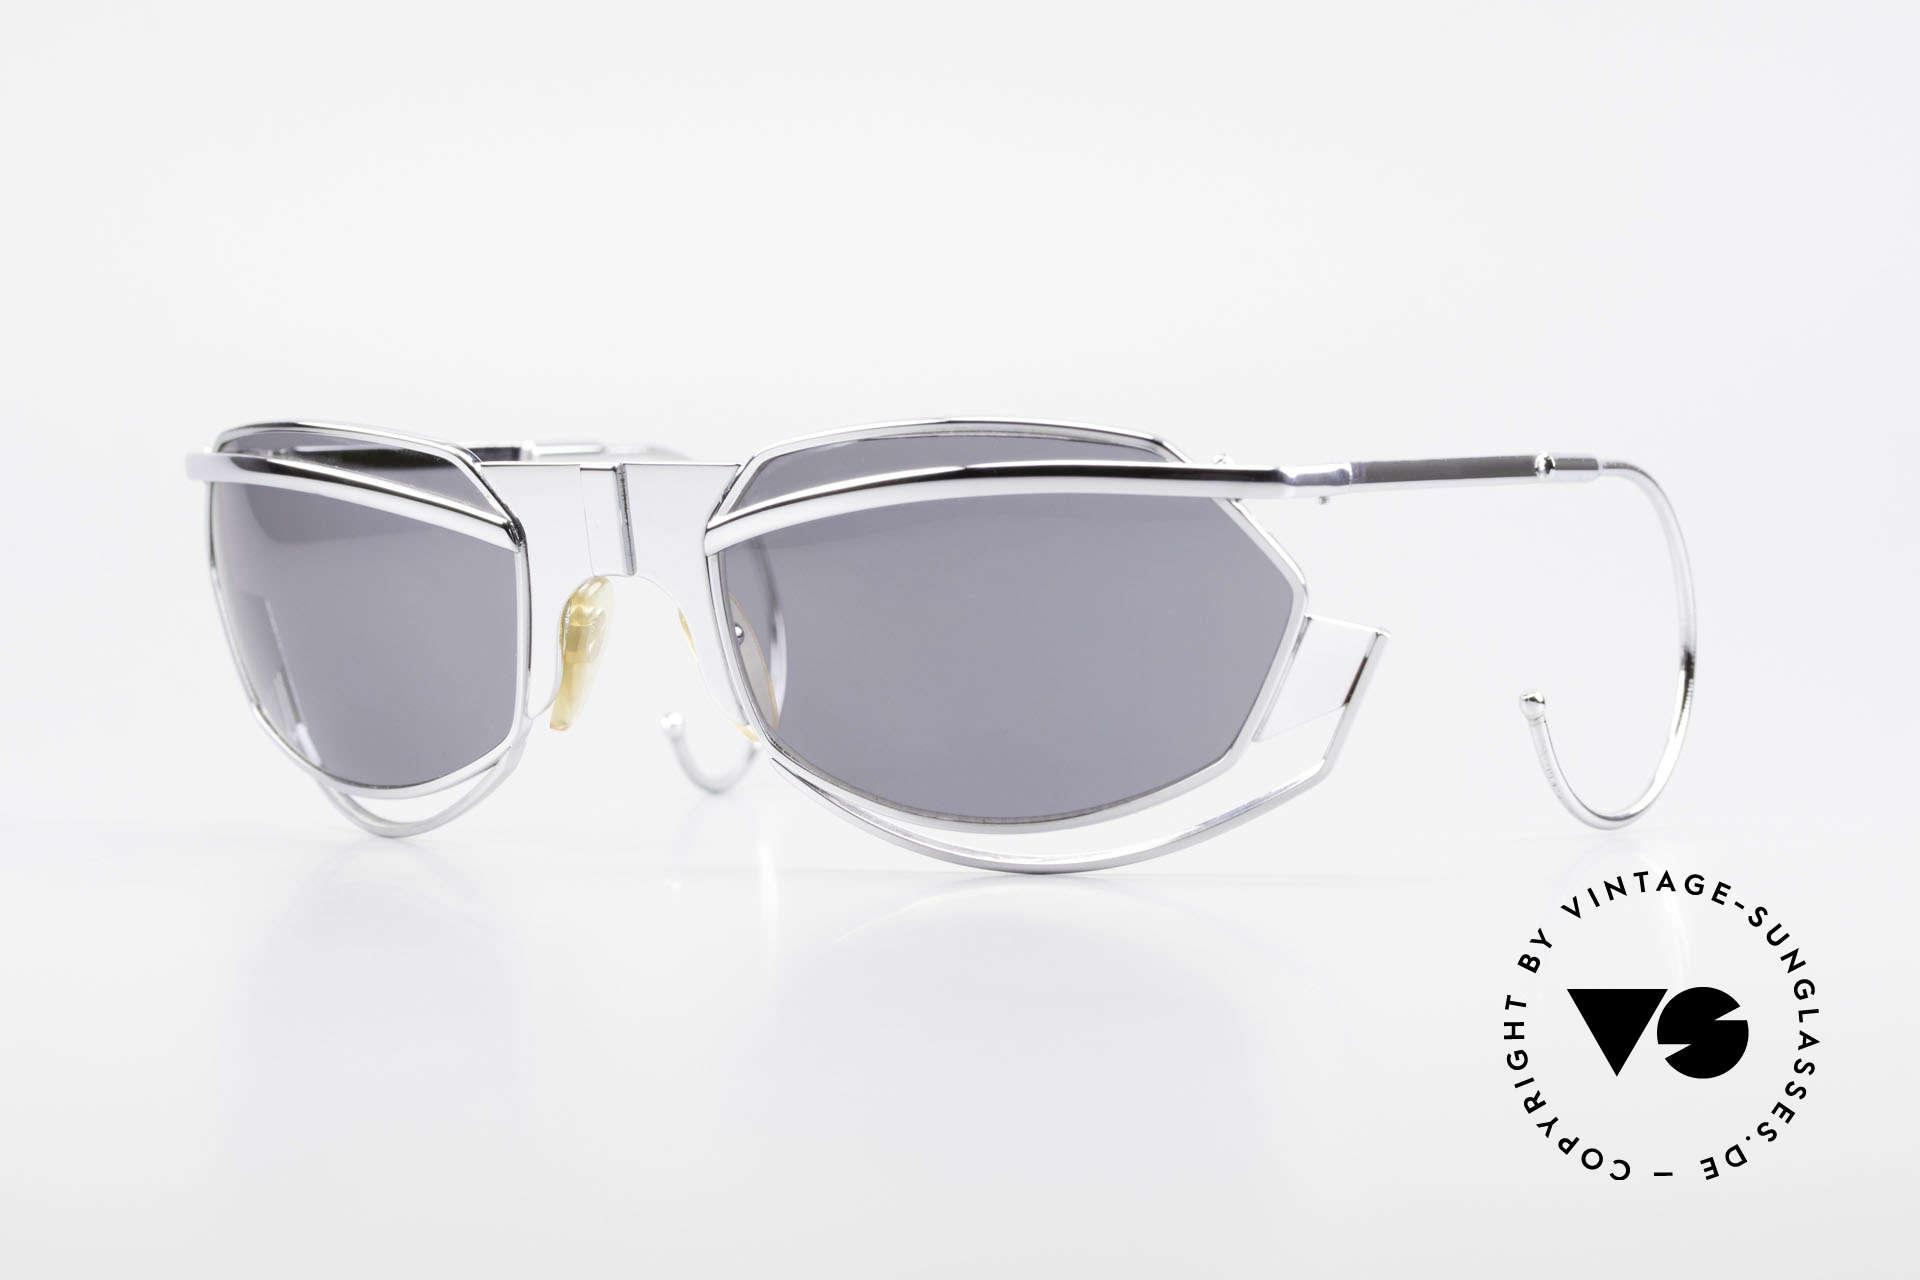 IDC G1 Folding Large Folding Sunglasses 90's, 'spacy' VINTAGE designer sunglasses by IDC, France, Made for Men